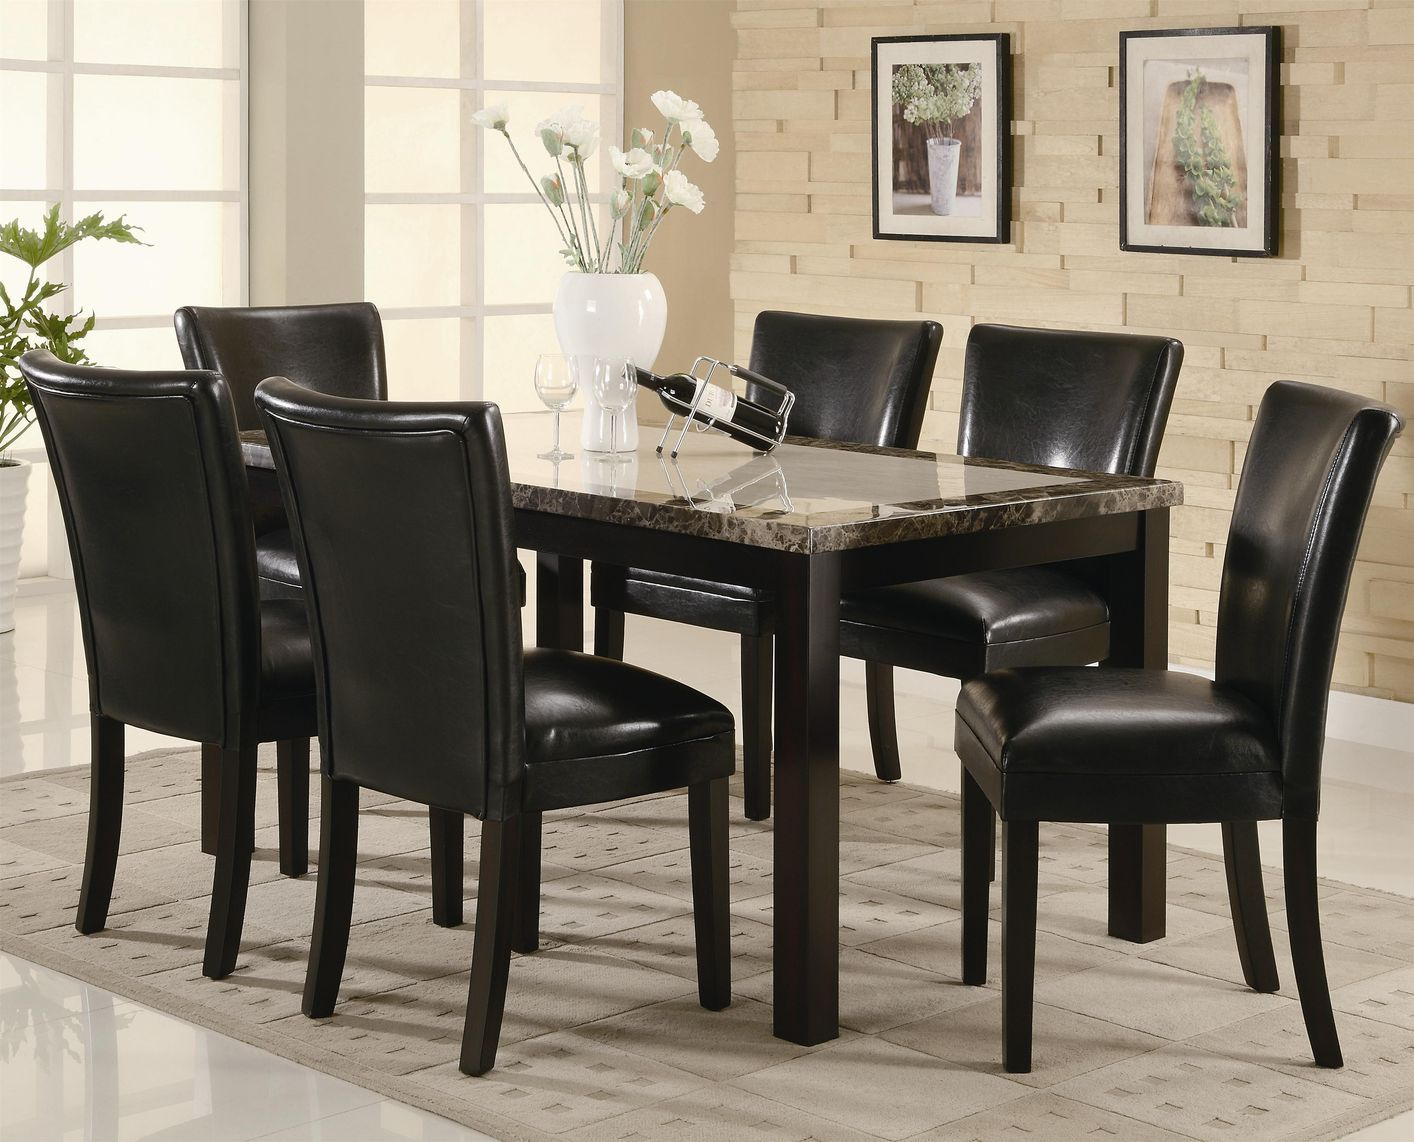 Bainbridge Ii 9Piece Dining Set  My Kitchen  Pinterest  Dining Unique Black And Brown Dining Room Sets Design Ideas